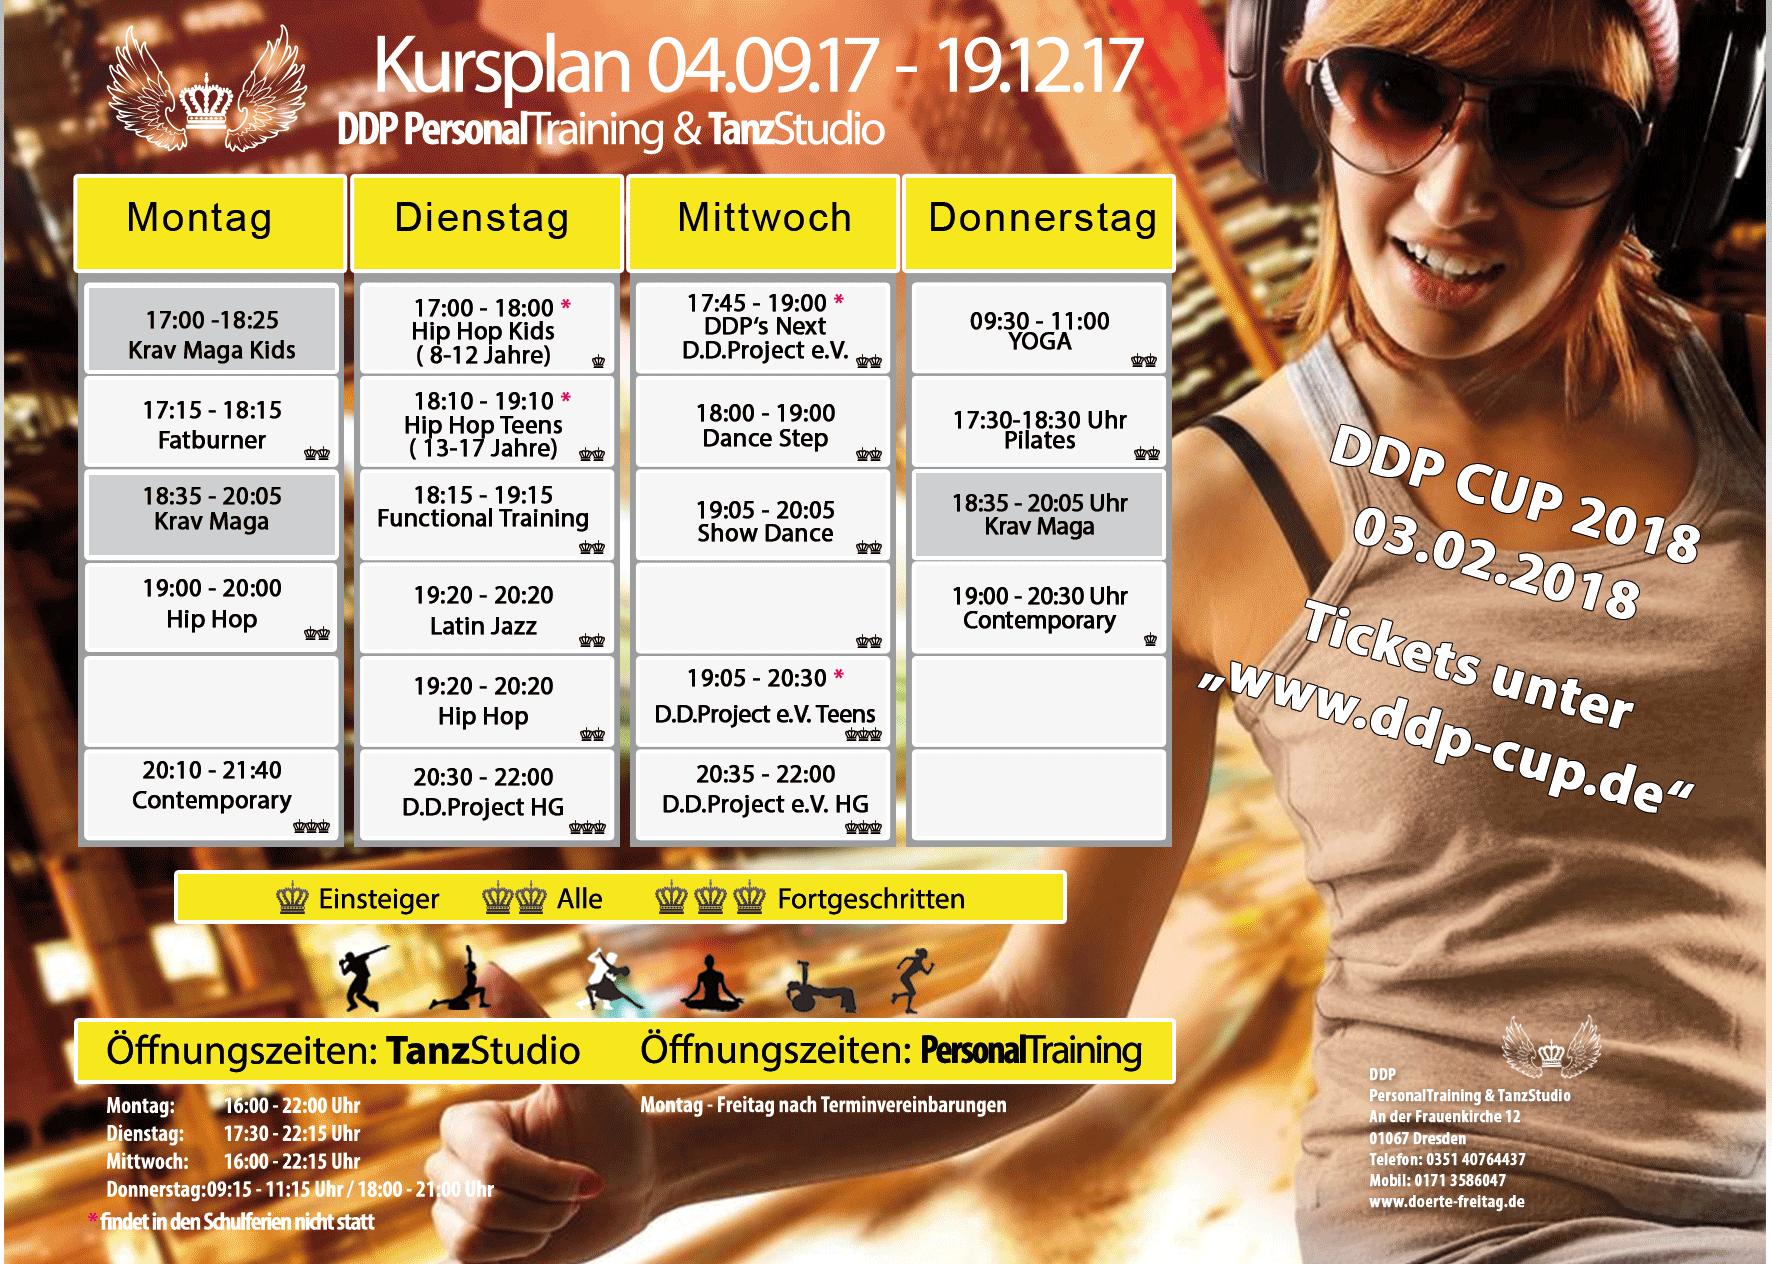 Kursplan-DDP-Tanzschule-Tanzstudio-Dresden-Doerte-Freitag-